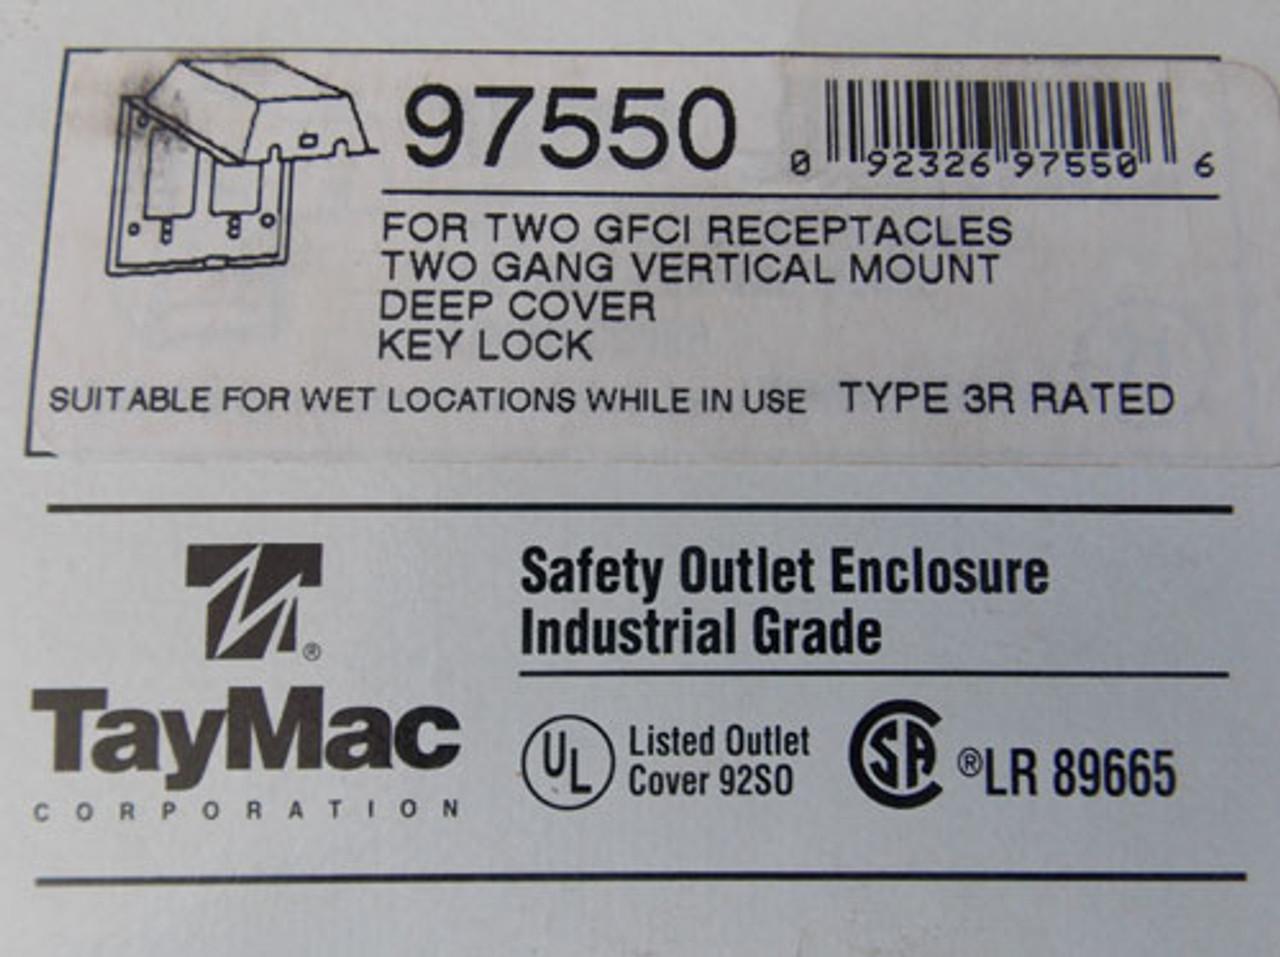 TayMac 97550 Two Gang Vertical Mount Deep Cover Key Lock Enclosure N3R - New